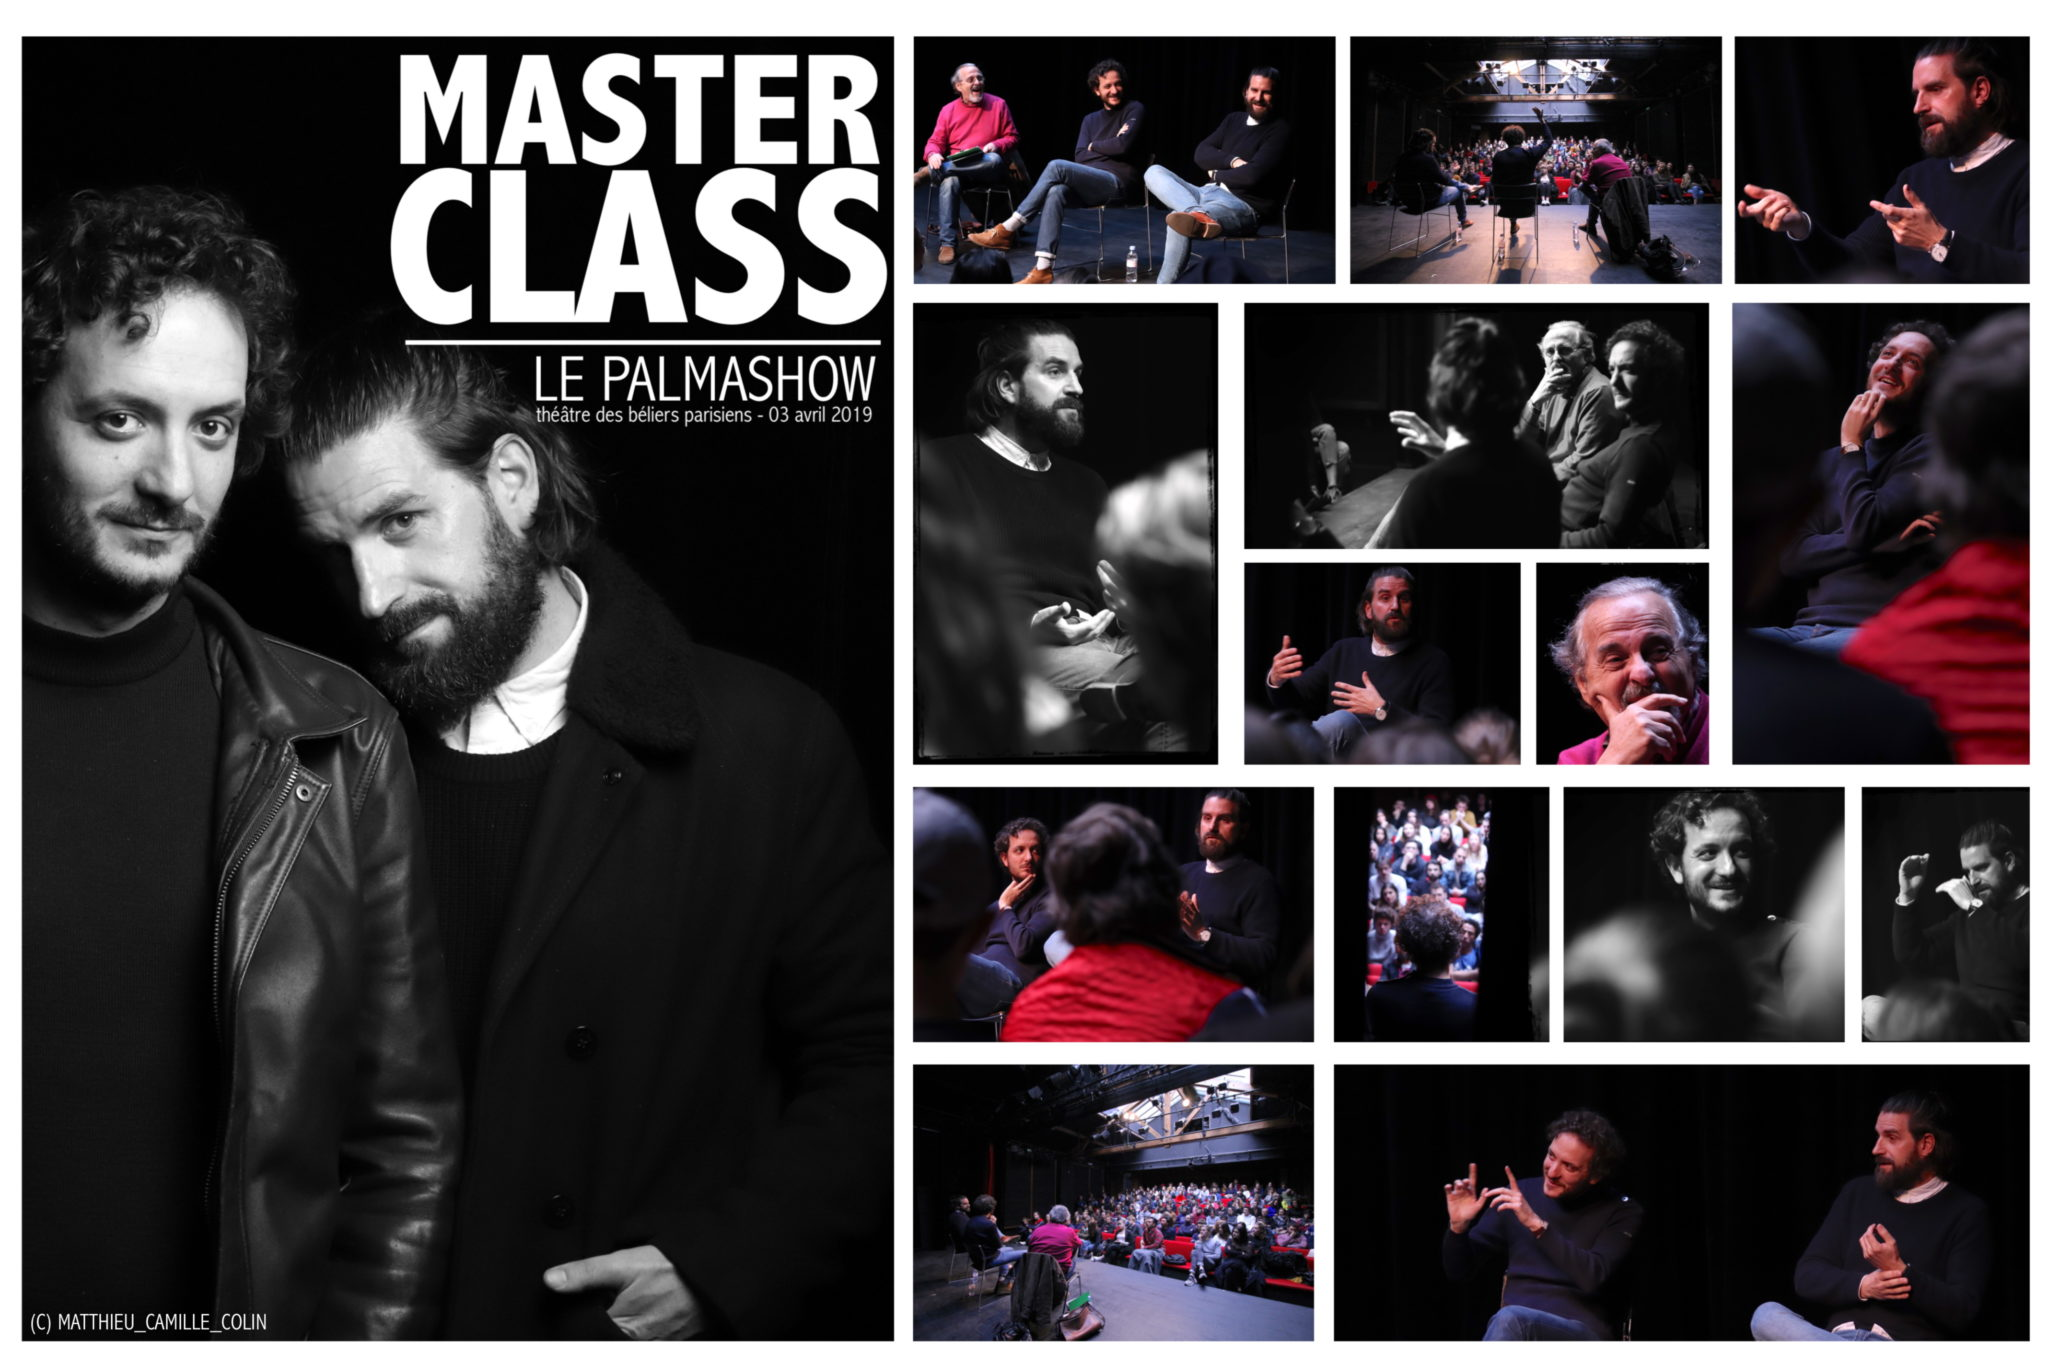 Master Class Palmashow